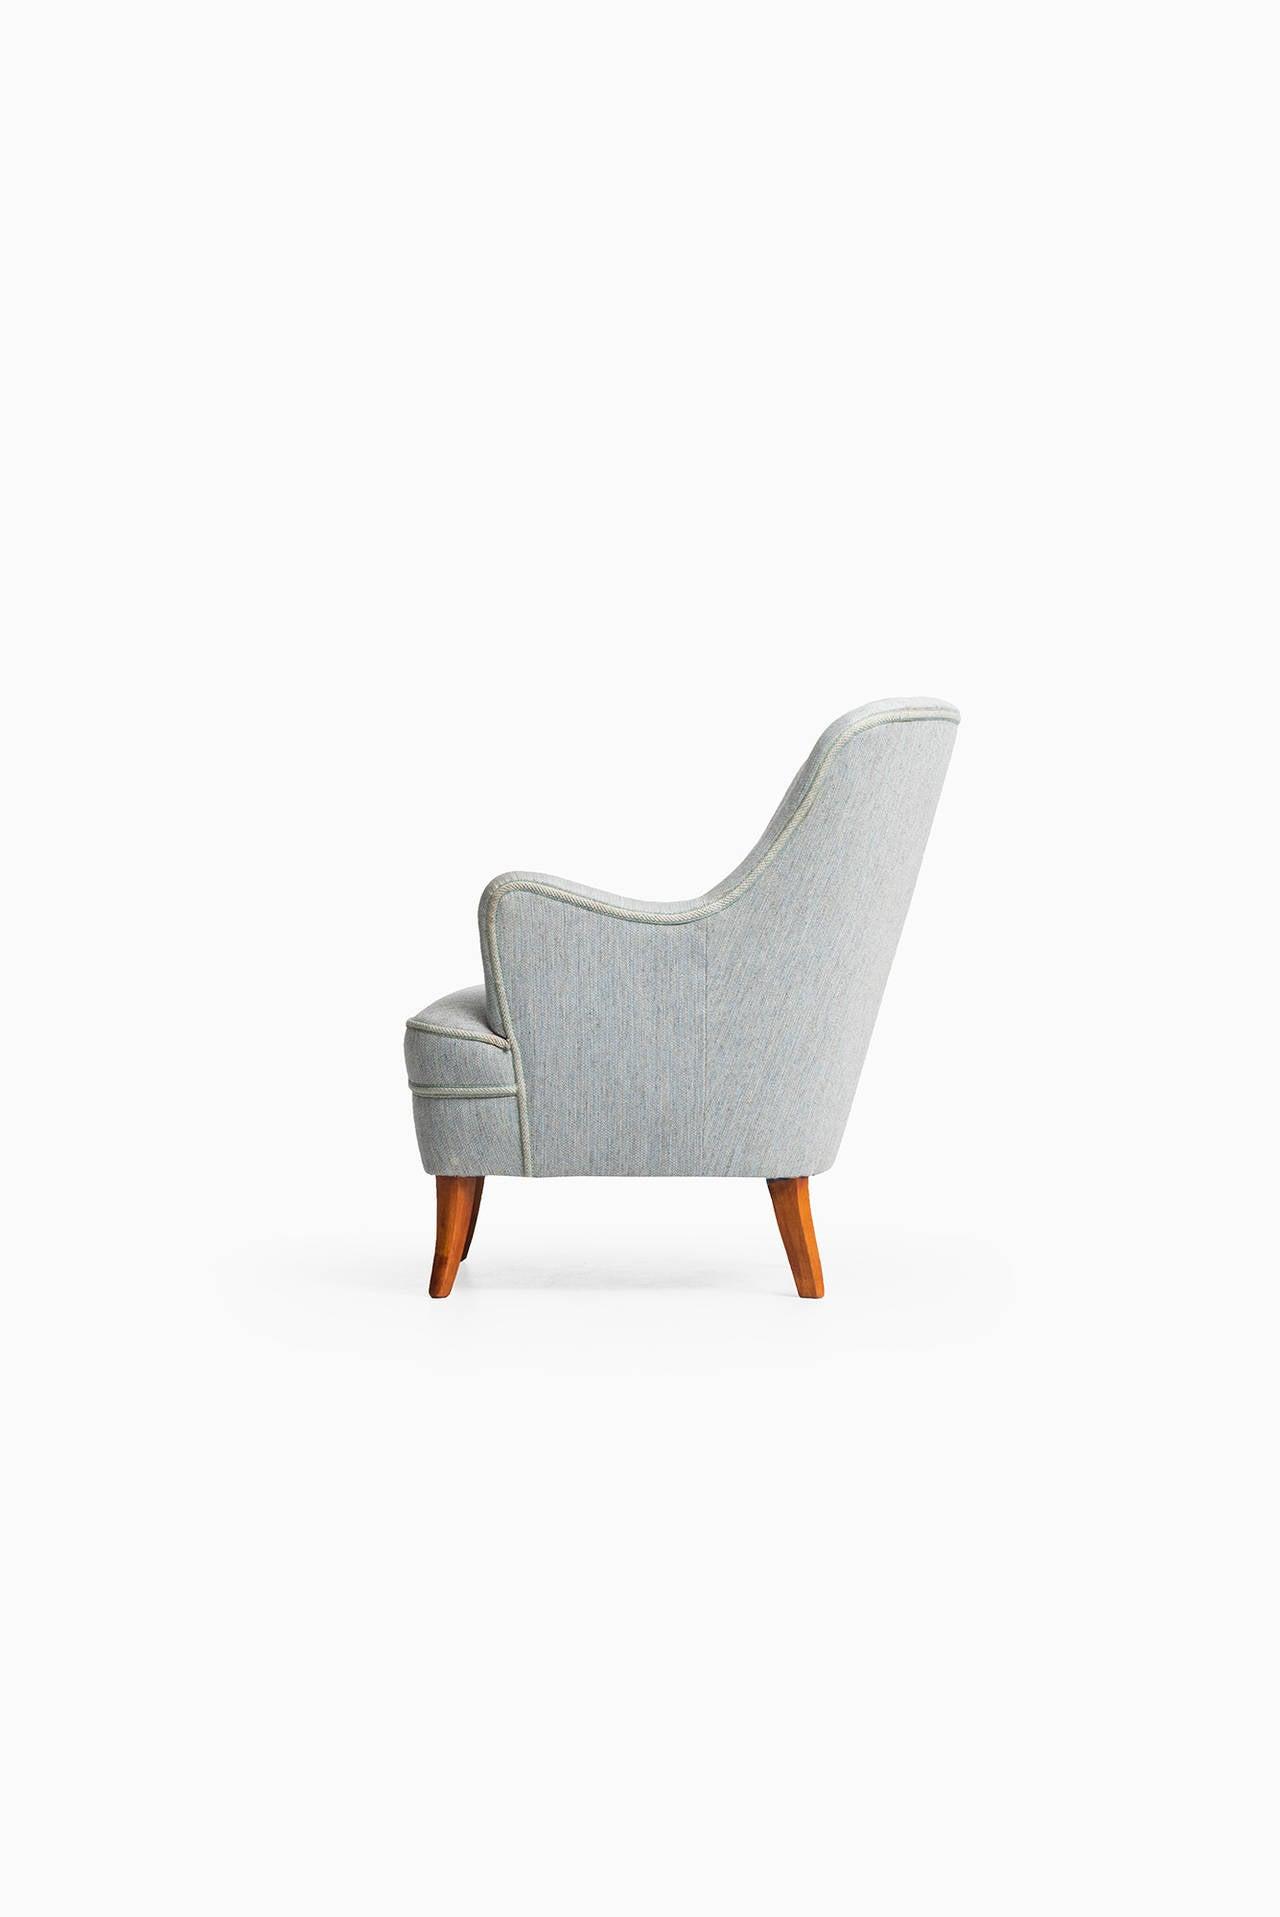 Mid-Century Modern Carl Malmsten Easy Chair by O.H Sjögren in Sweden For Sale